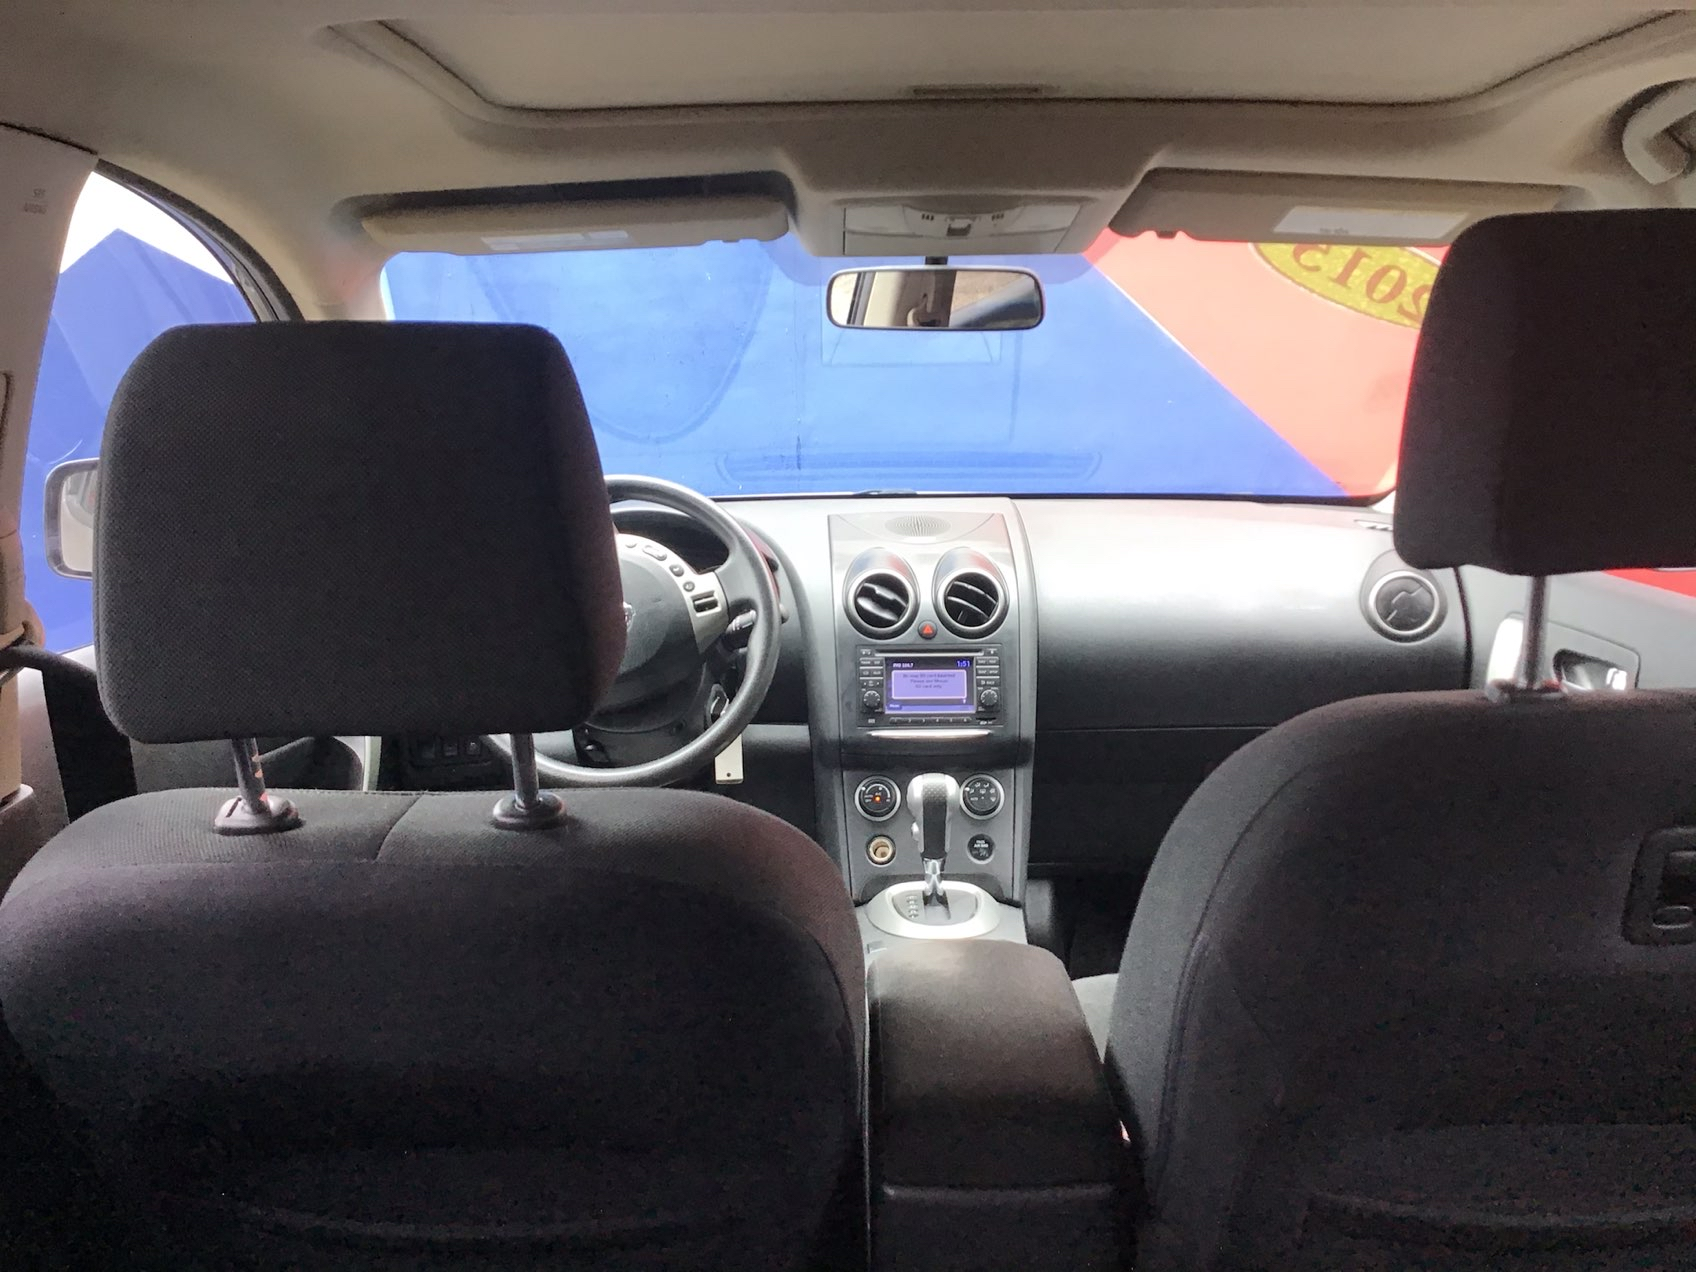 used vehicle - SUV NISSAN ROGUE 2013